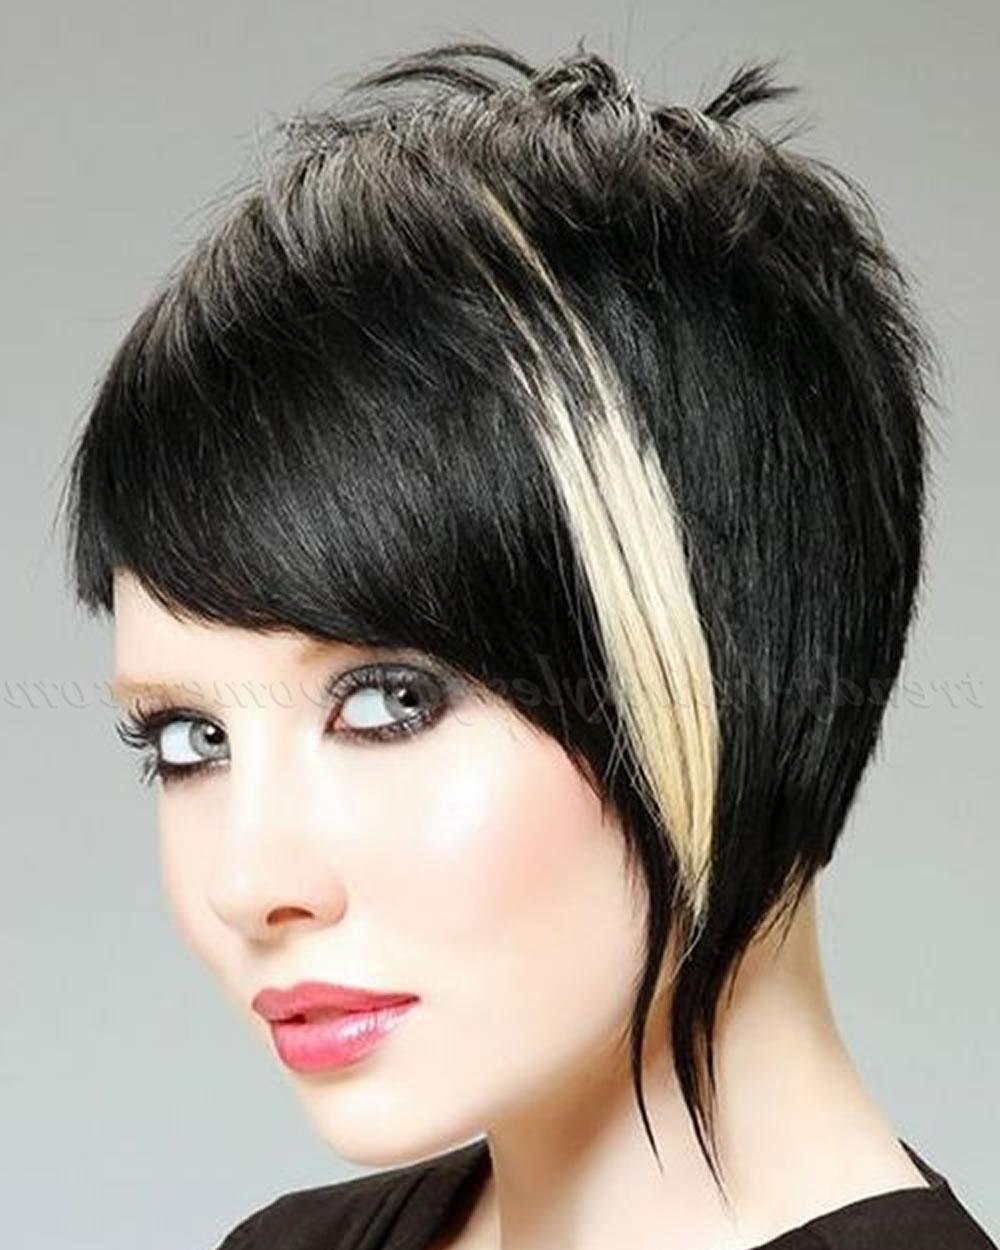 Asymmetrical Short Hair 2018 – 33 Haute Short Hairstyles & Haircuts Inside Asymmetrical Short Hairstyles (View 5 of 25)